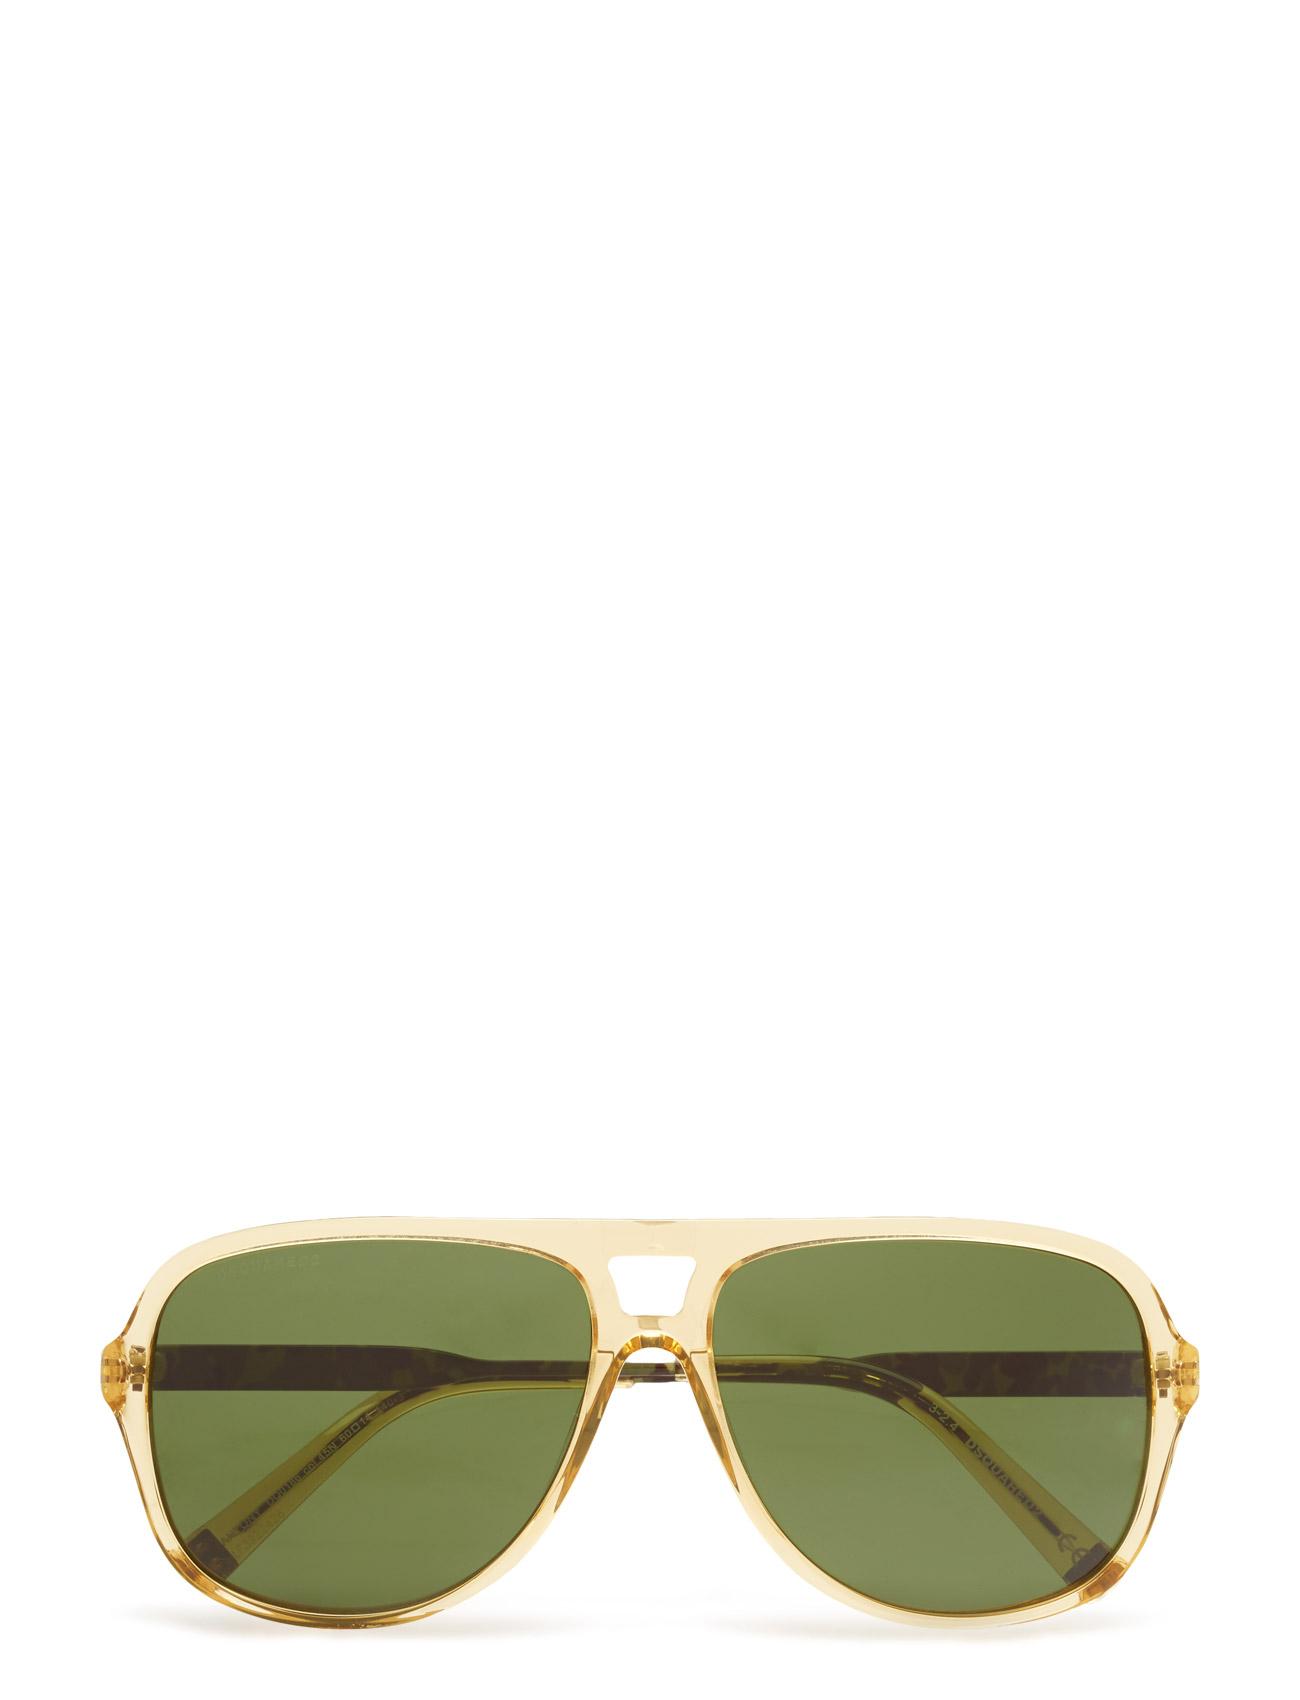 Dq0186 DSQUARED2 Sunglasses Solbriller til Herrer i